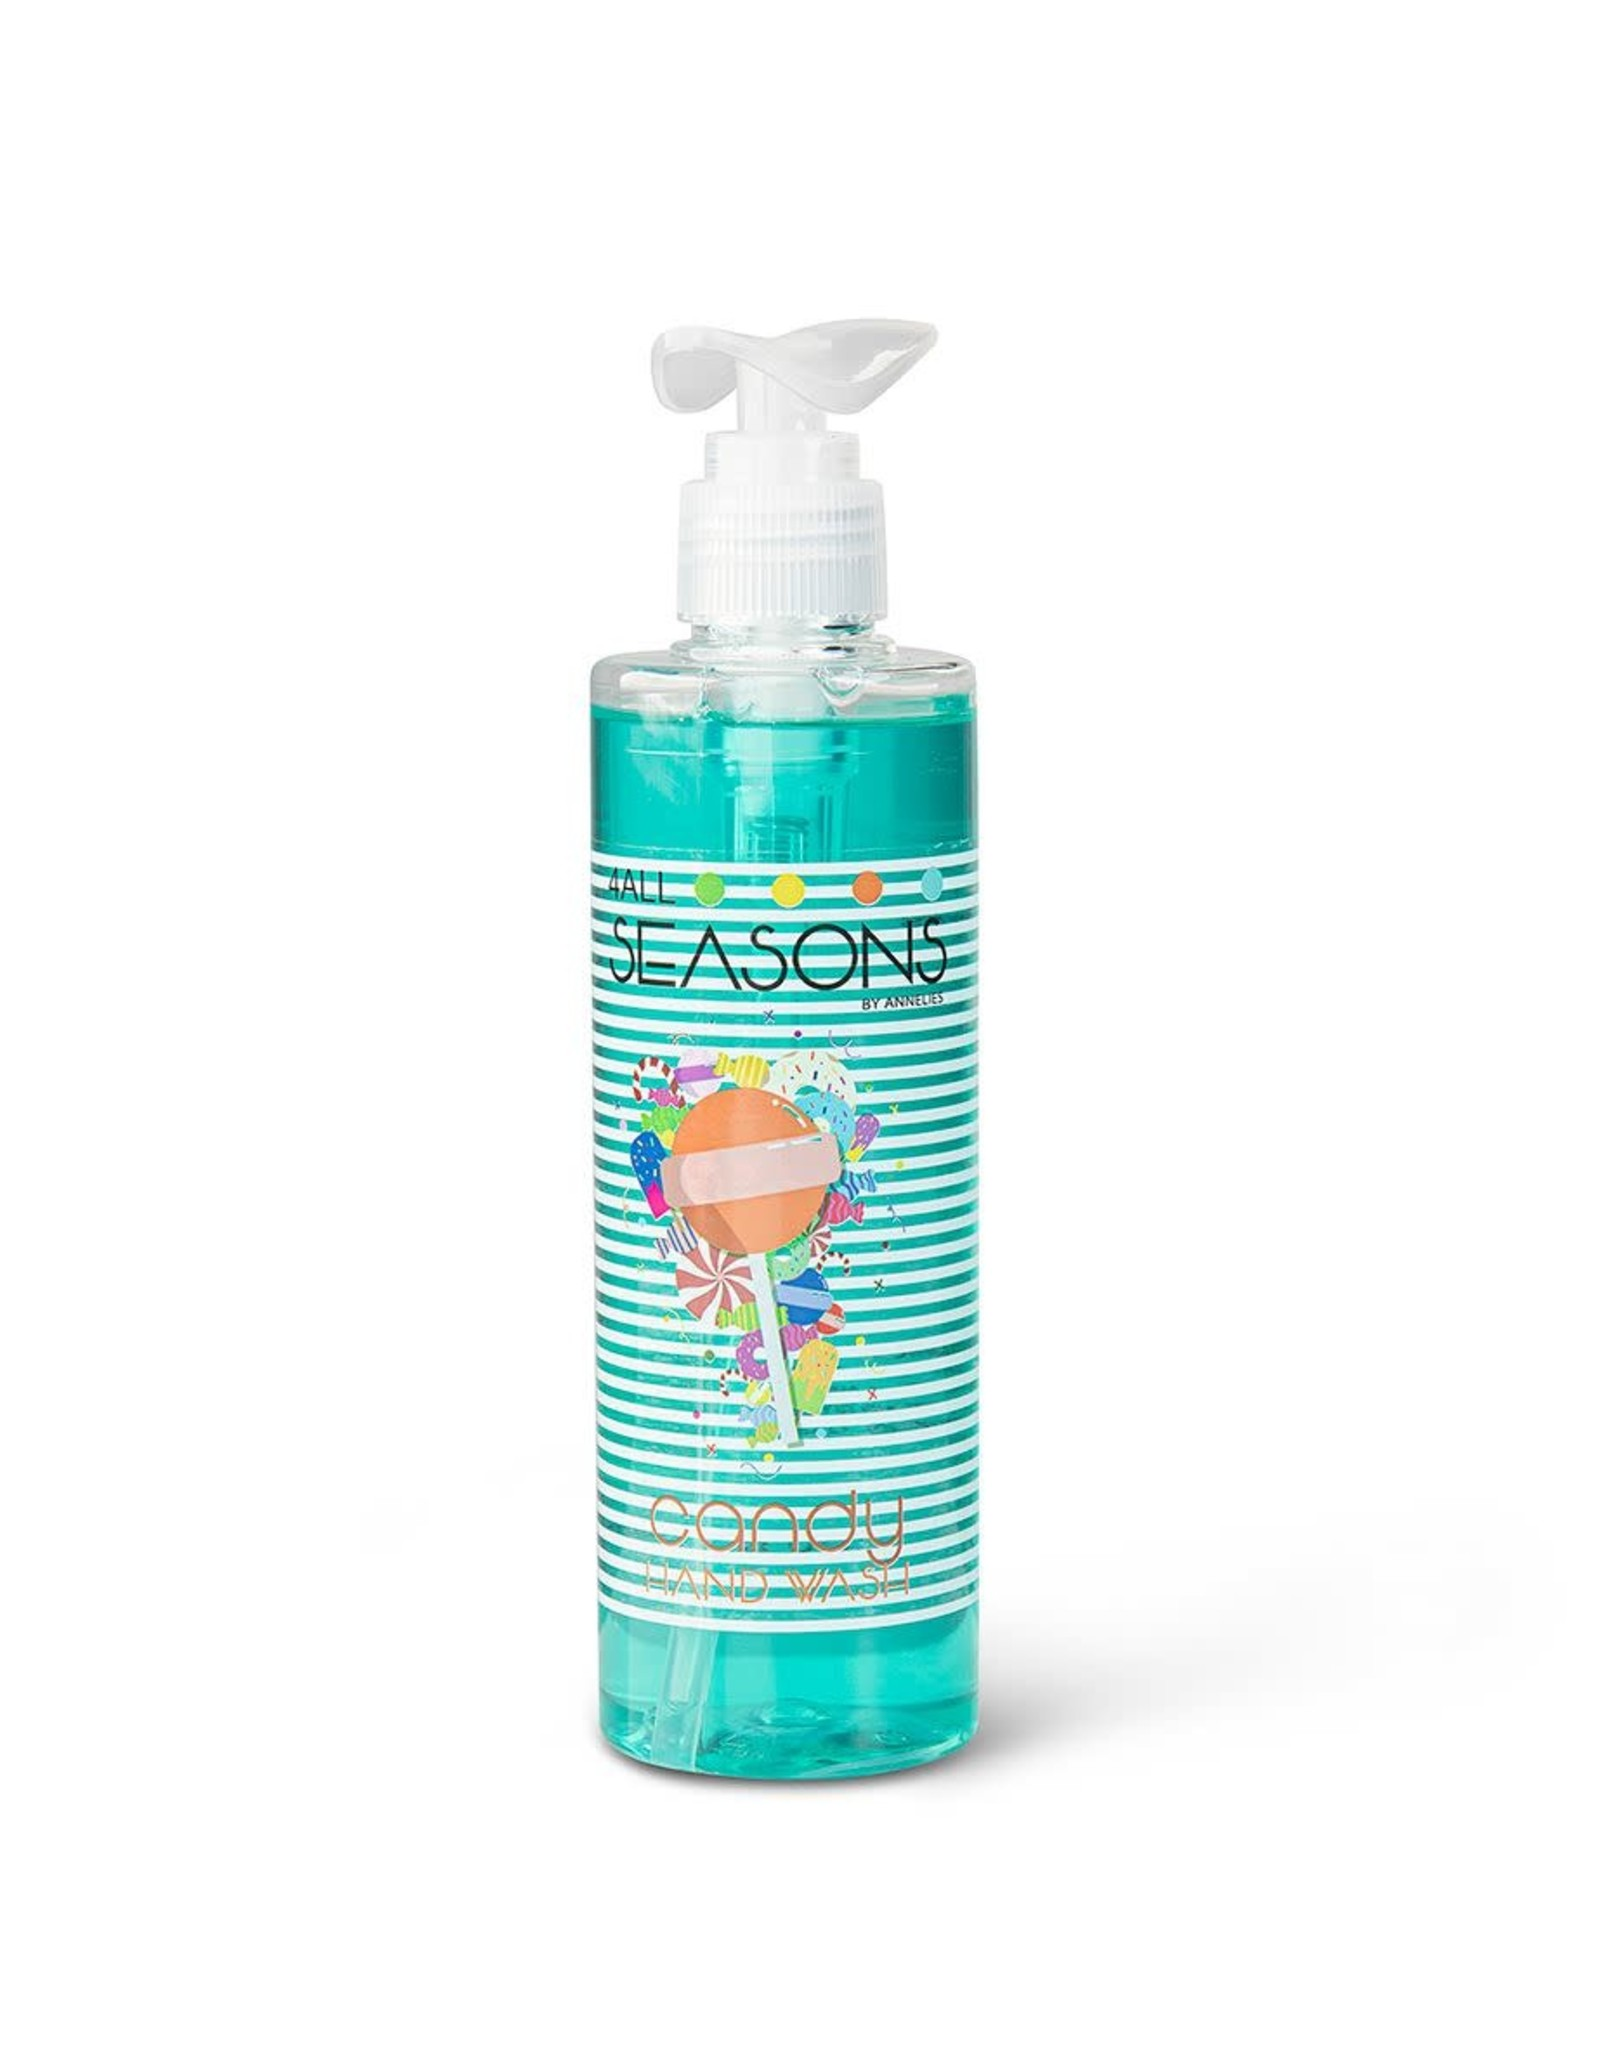 4 all seasons 4 All seasons hand wash Candy 250 ml